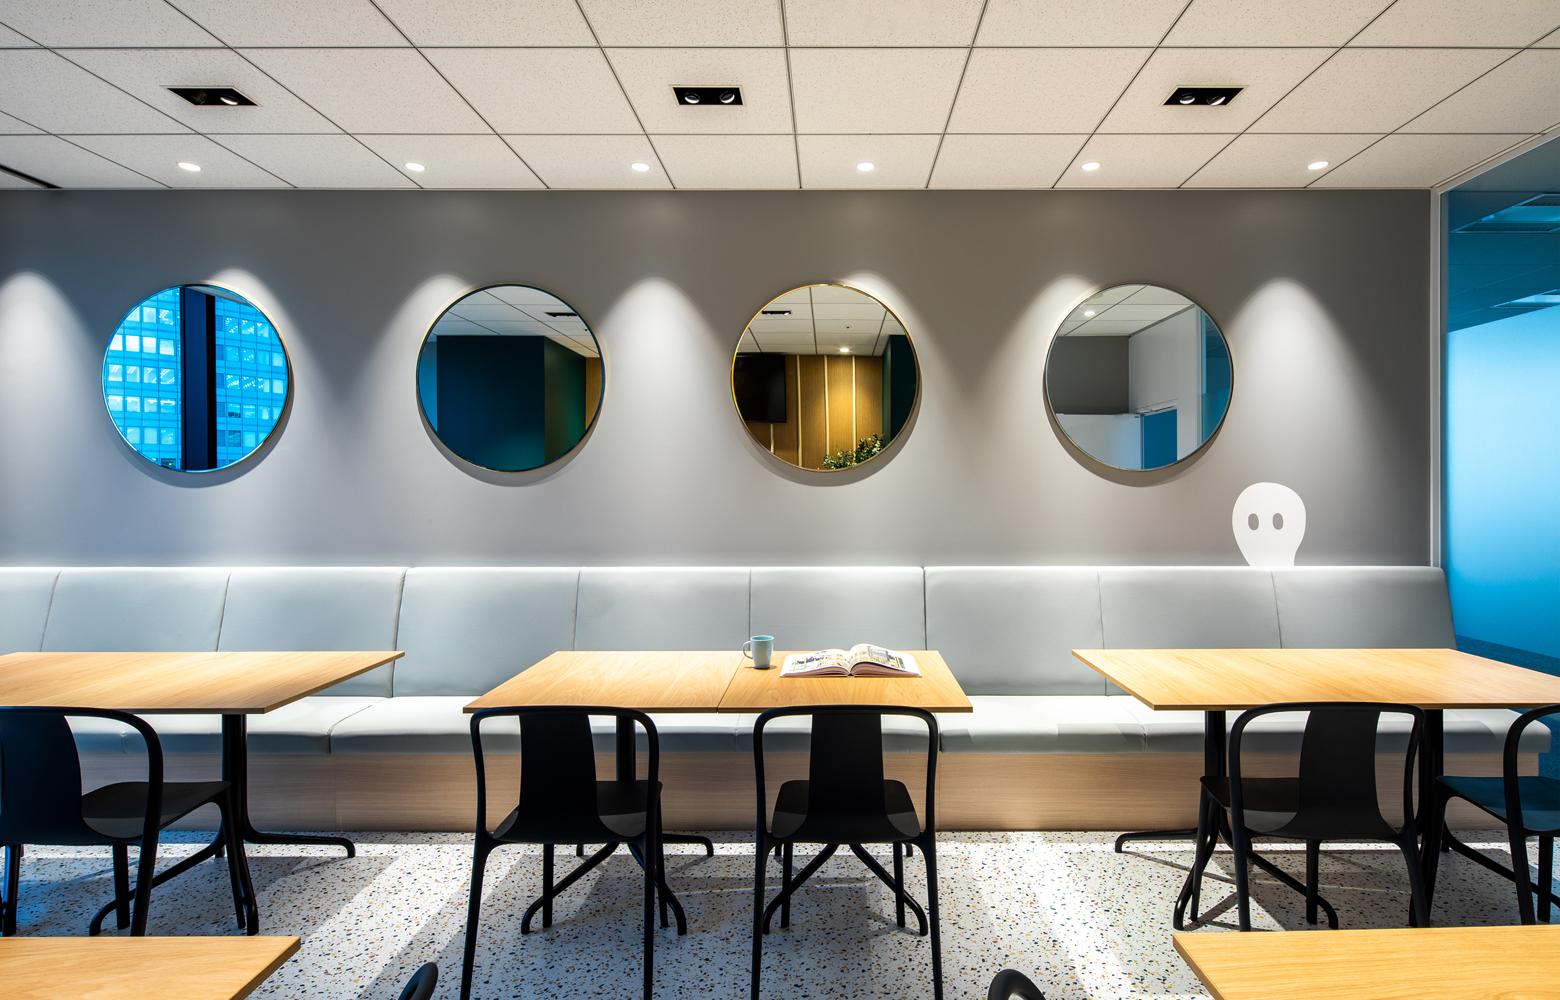 KLab株式会社 Roppongi Office Refresh Space_3 デザイン・レイアウト事例